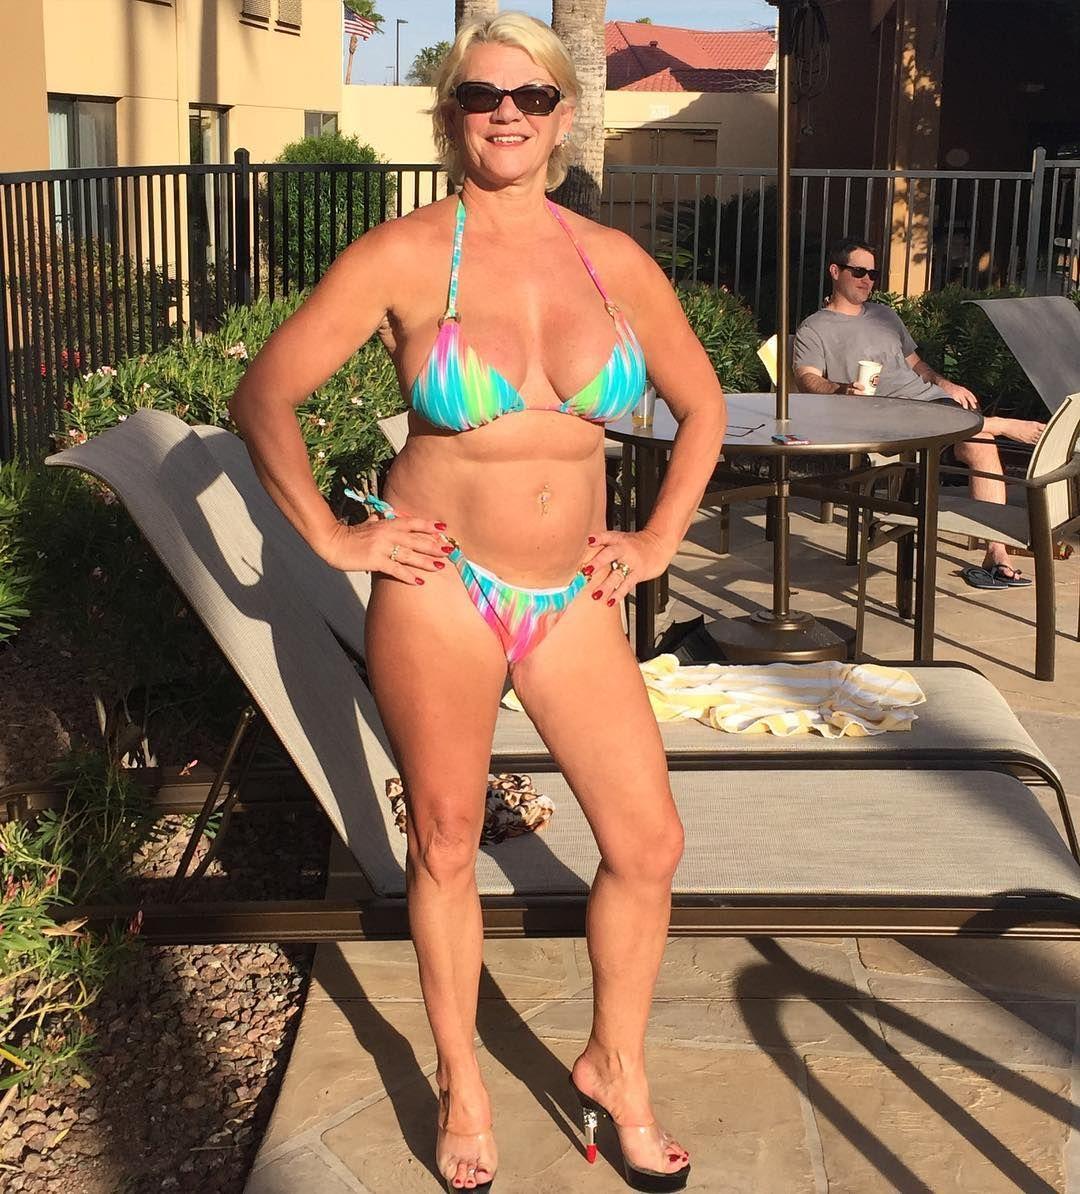 bikini cougars